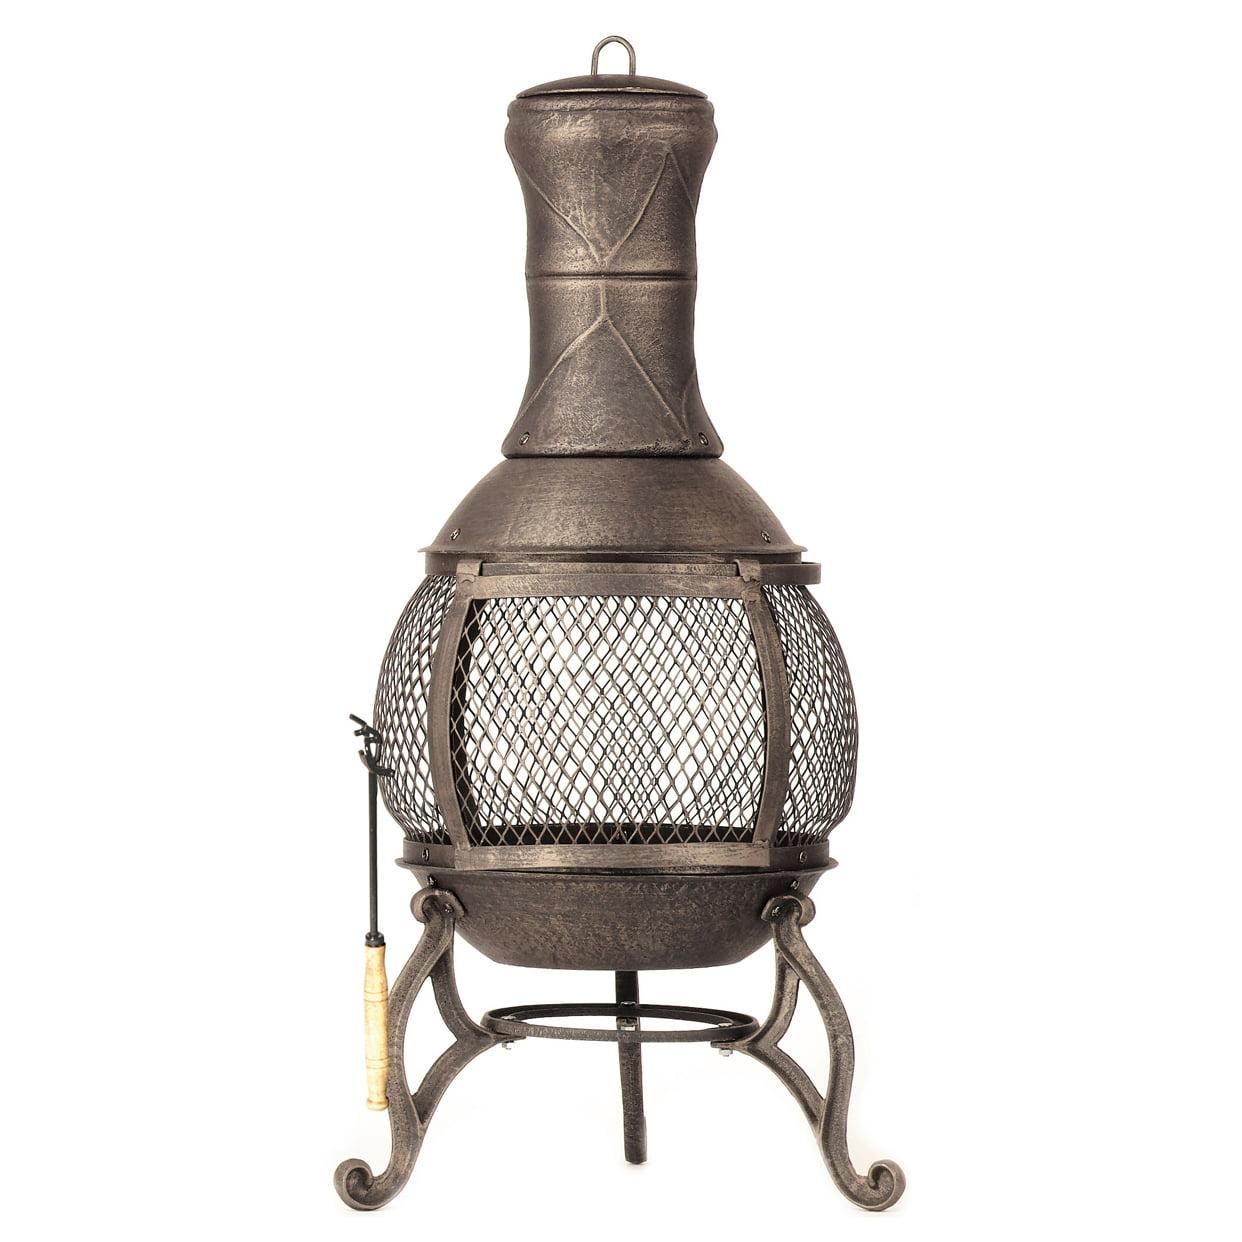 Kay Home 30075 Corona Outdoor Fireplace